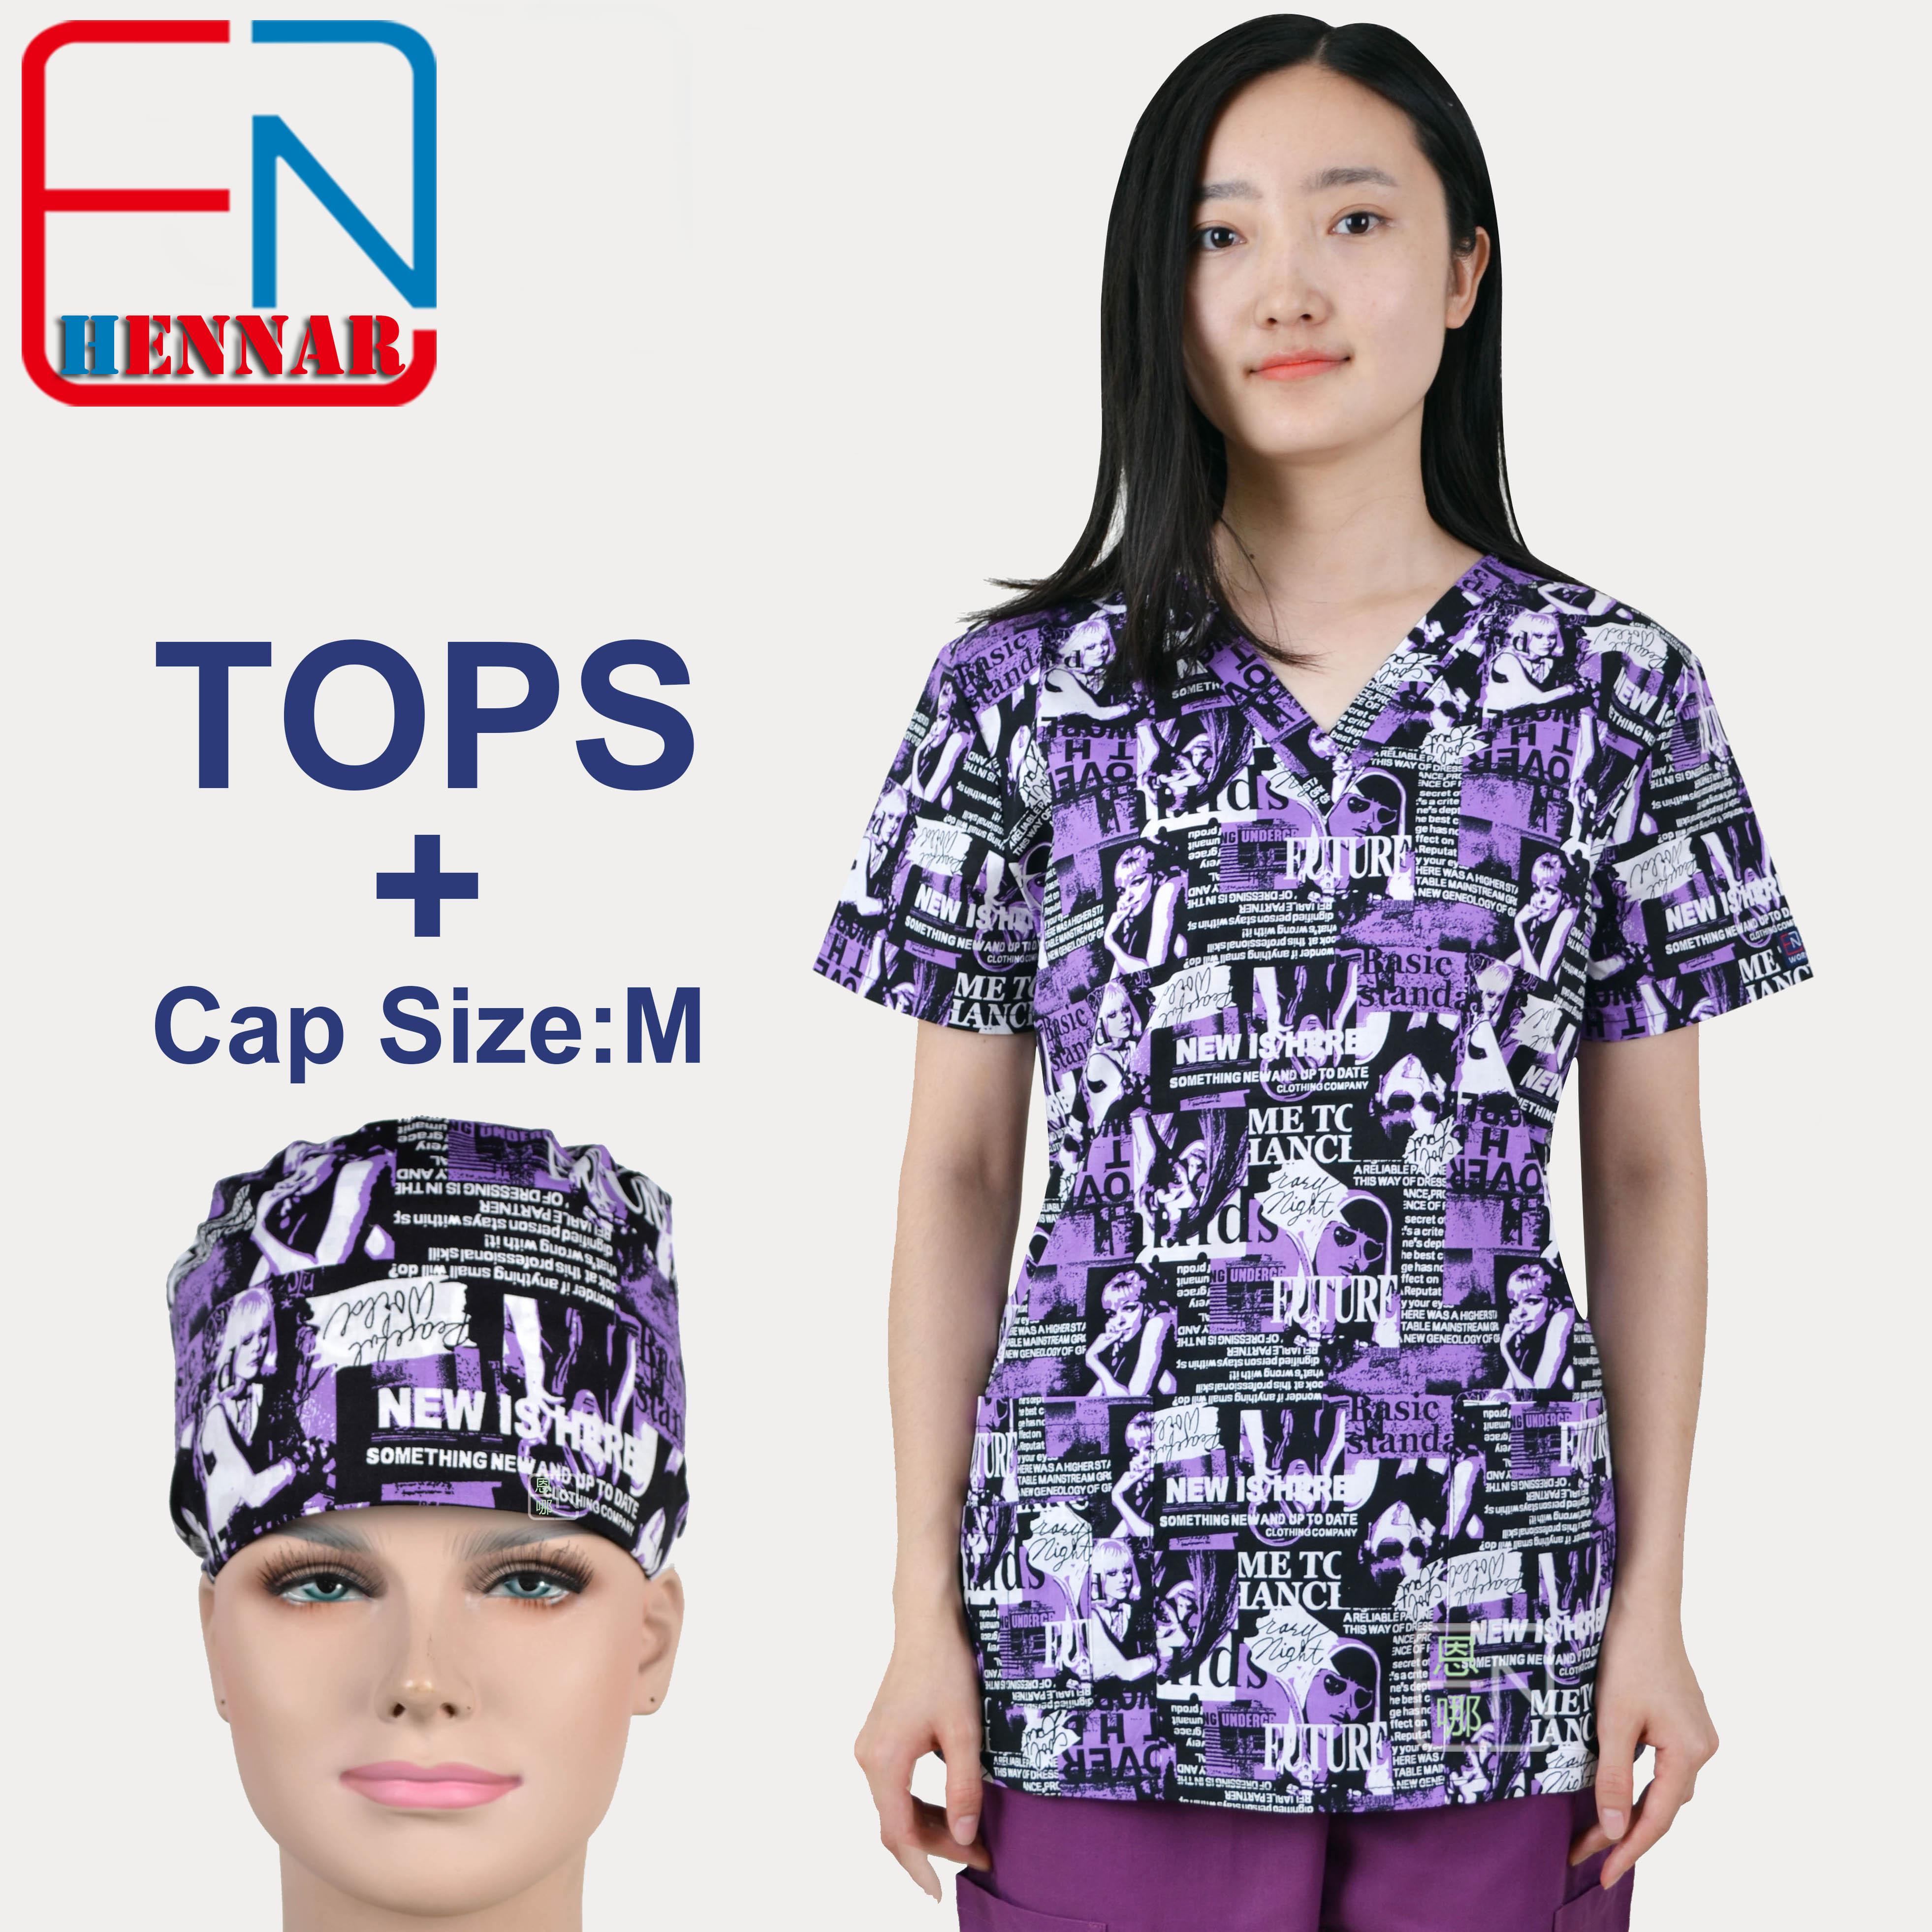 Hennar Print Women Medical Scrub Tops 100% Cotton Hospital Medical Uniforms Doctor Dentist Work Scrub Top V-Neck Short Sleeves